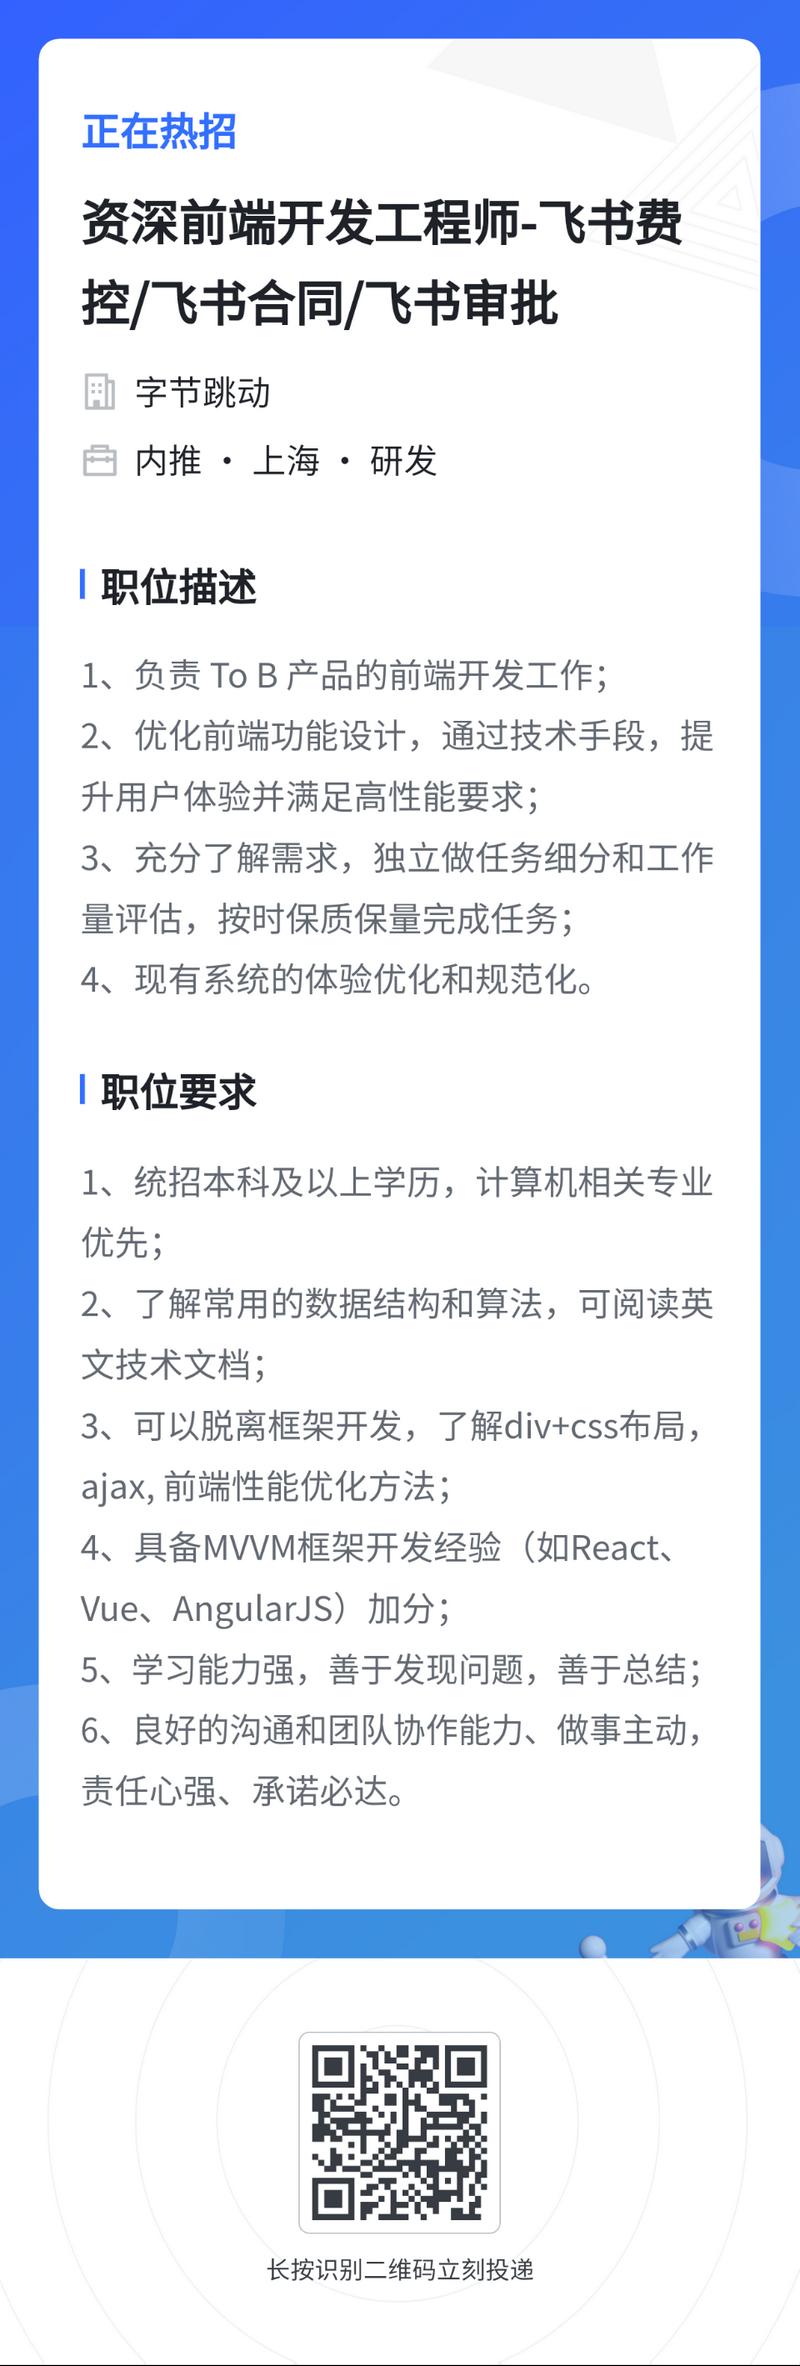 xiaowua于2021-05-20 11:21发布的图片